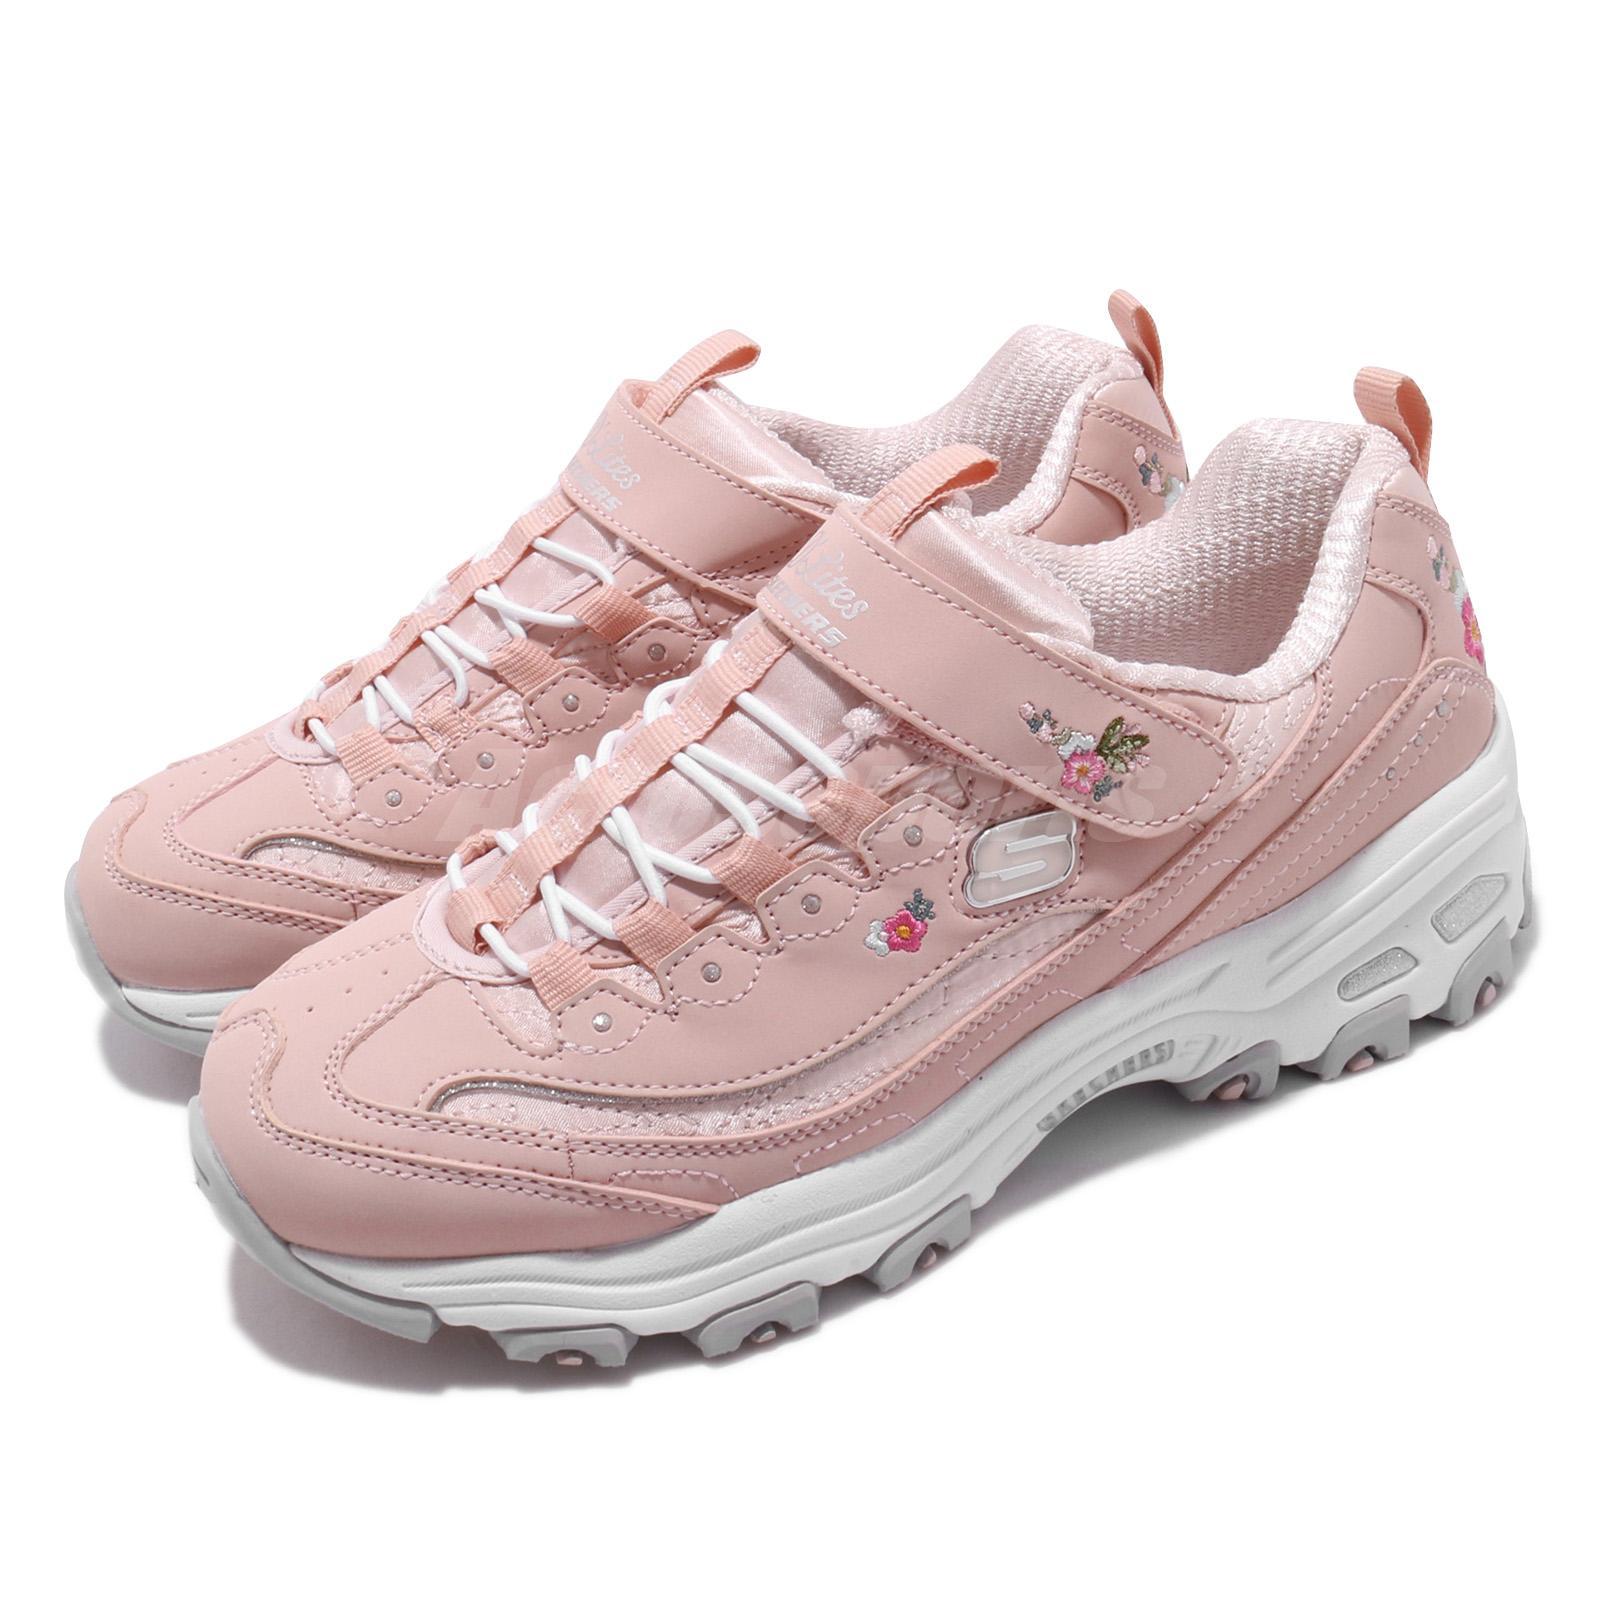 Details about Skechers D Lites LIL Blossom Light Pink White Floral Kid Women Shoes 80579L LTPK